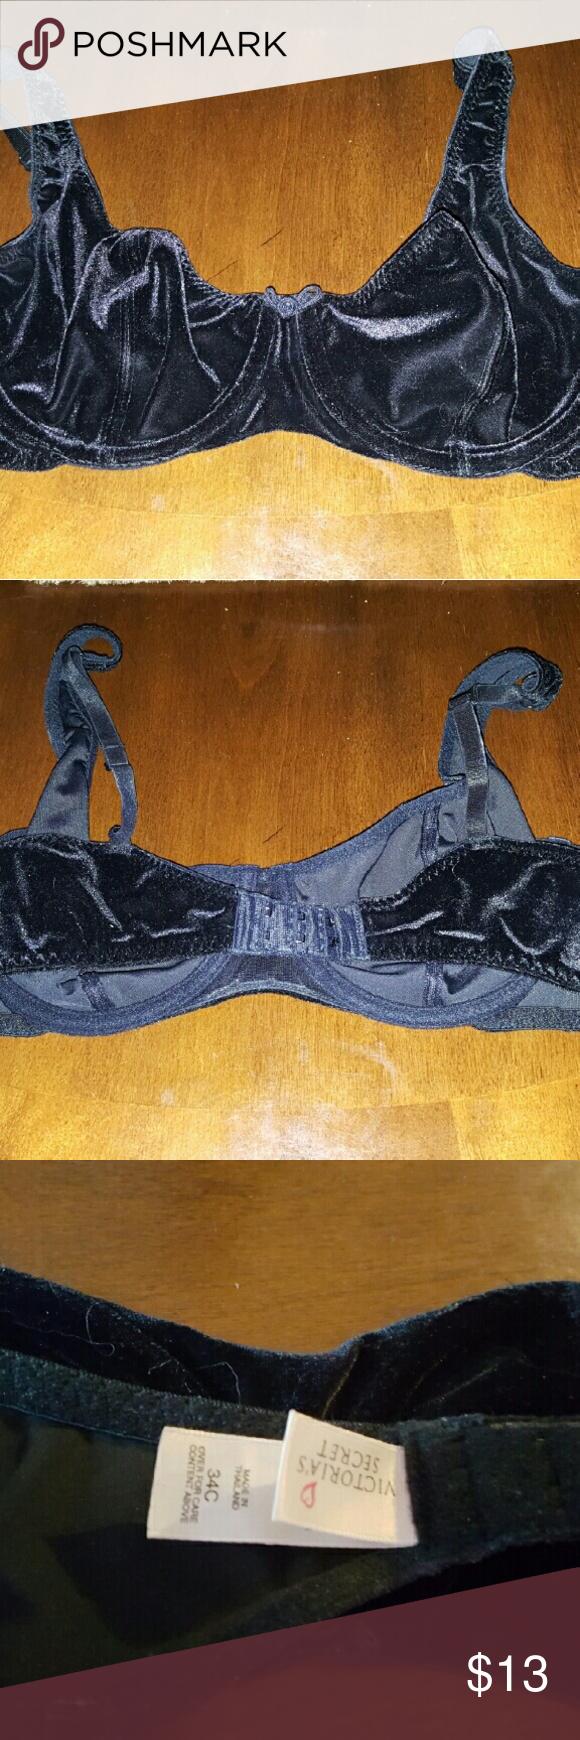 Victoria's secret Velvet bra Black Velvet with underwire Size 34C Preowned Victoria's Secret Intimates & Sleepwear Bras